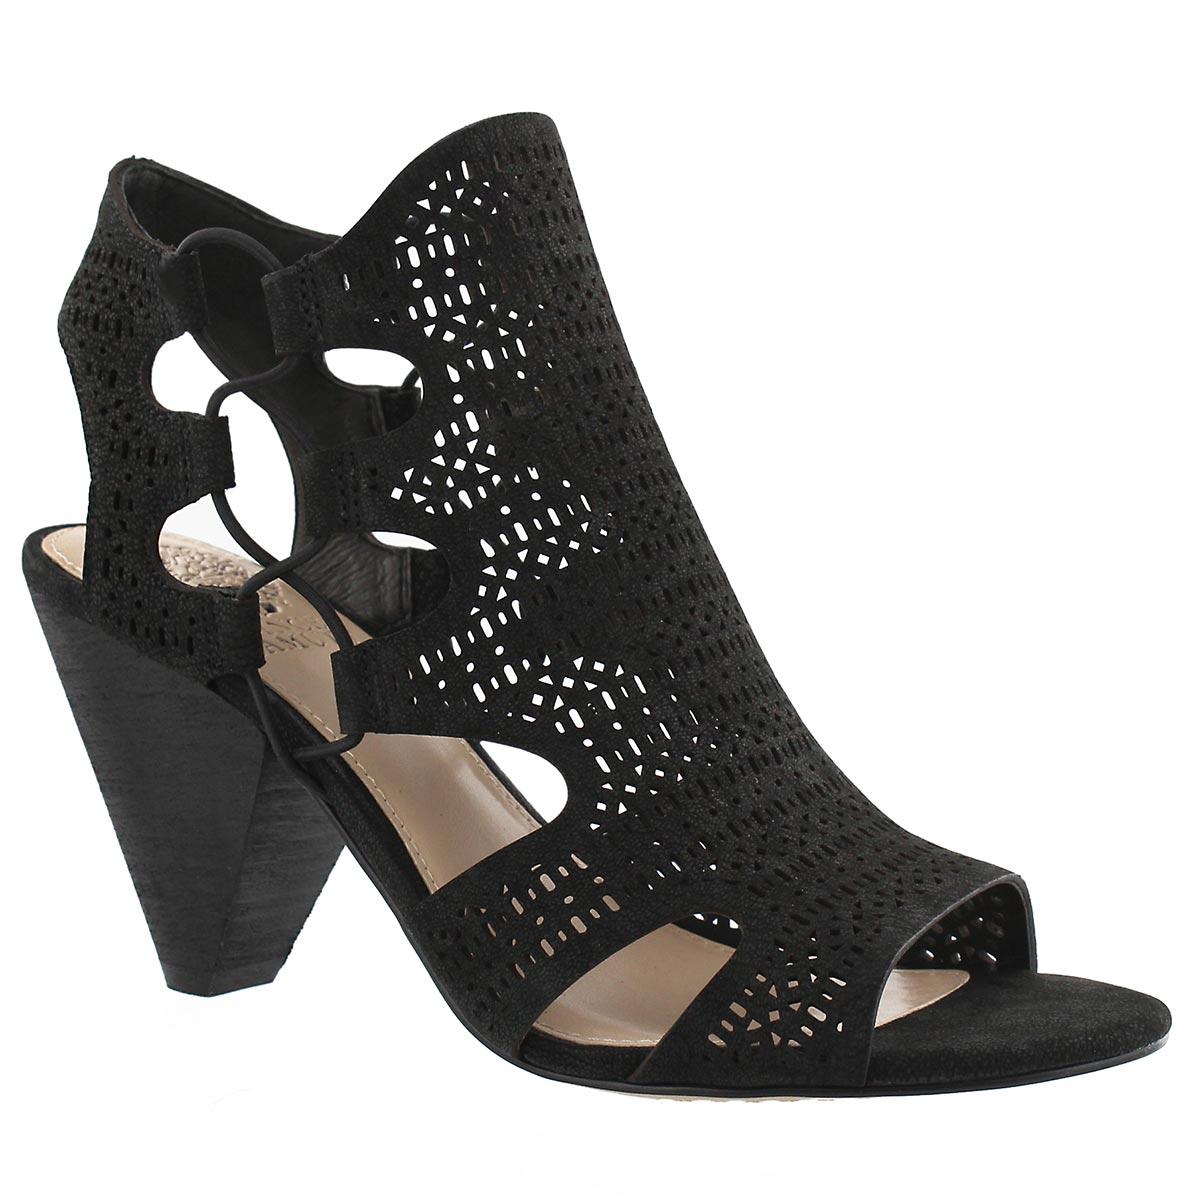 Women's EADON black dress sandals